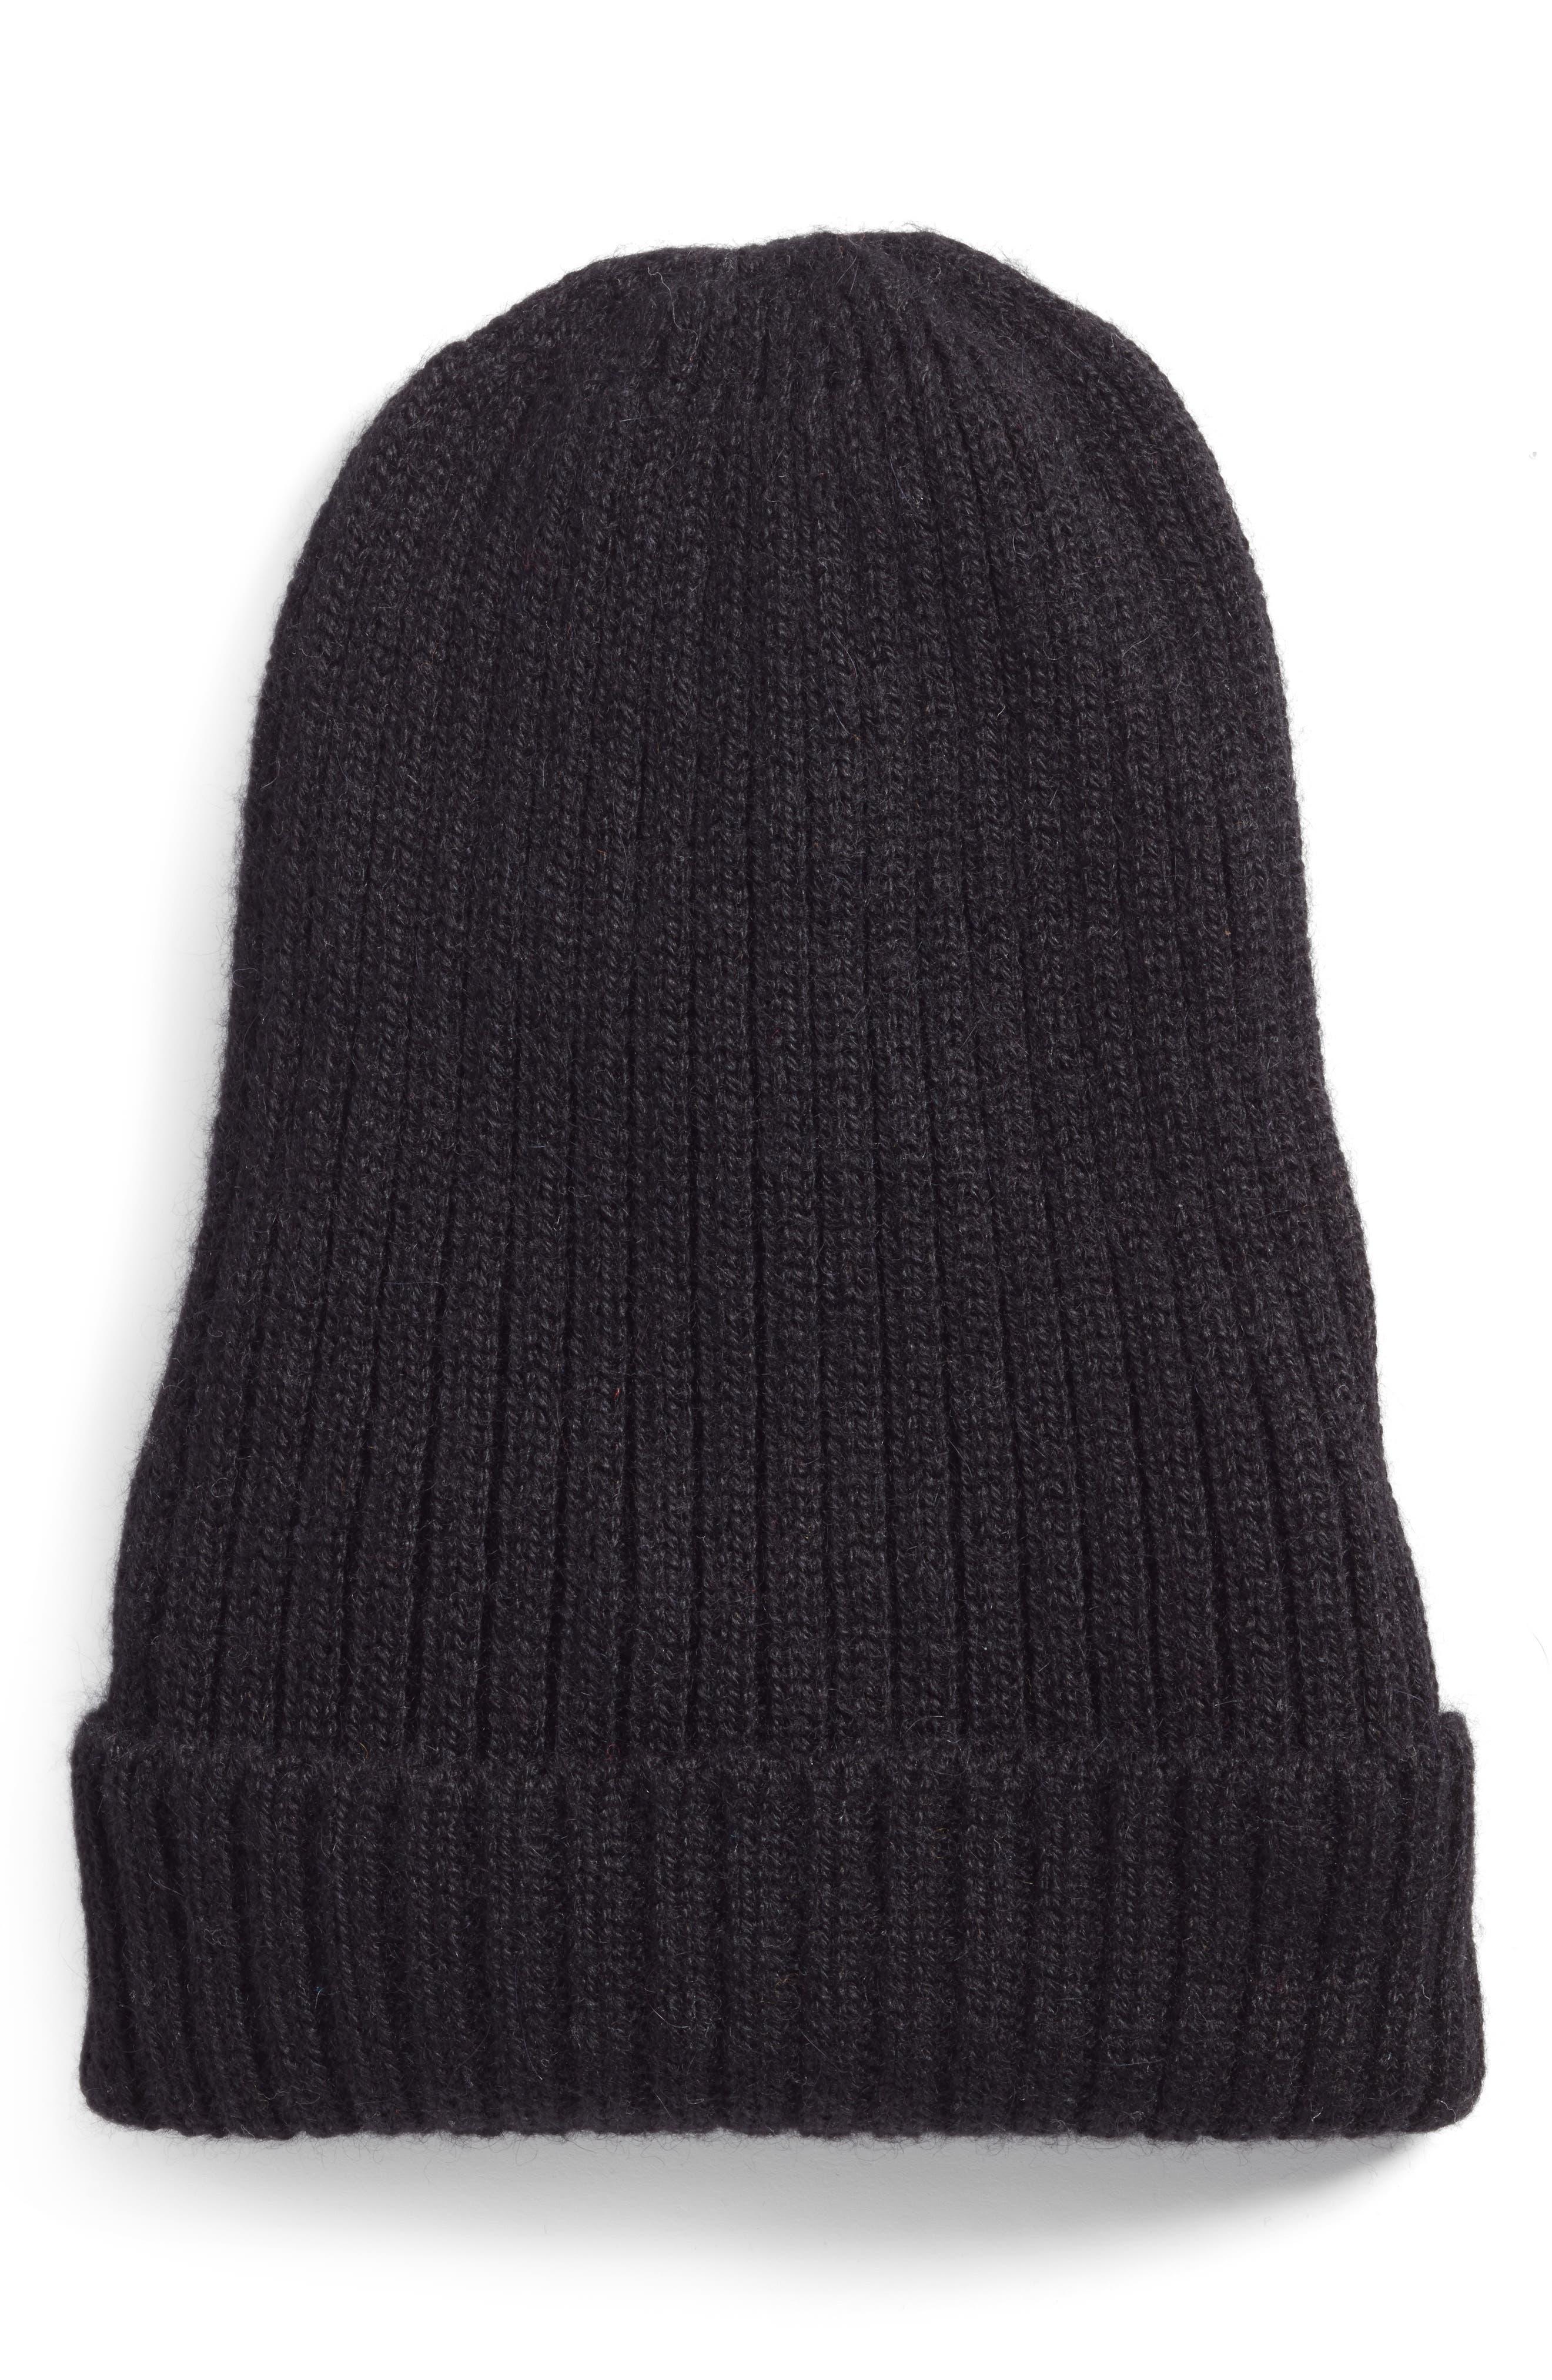 Nolita Alpaca Rib Knit Beanie,                         Main,                         color, Black